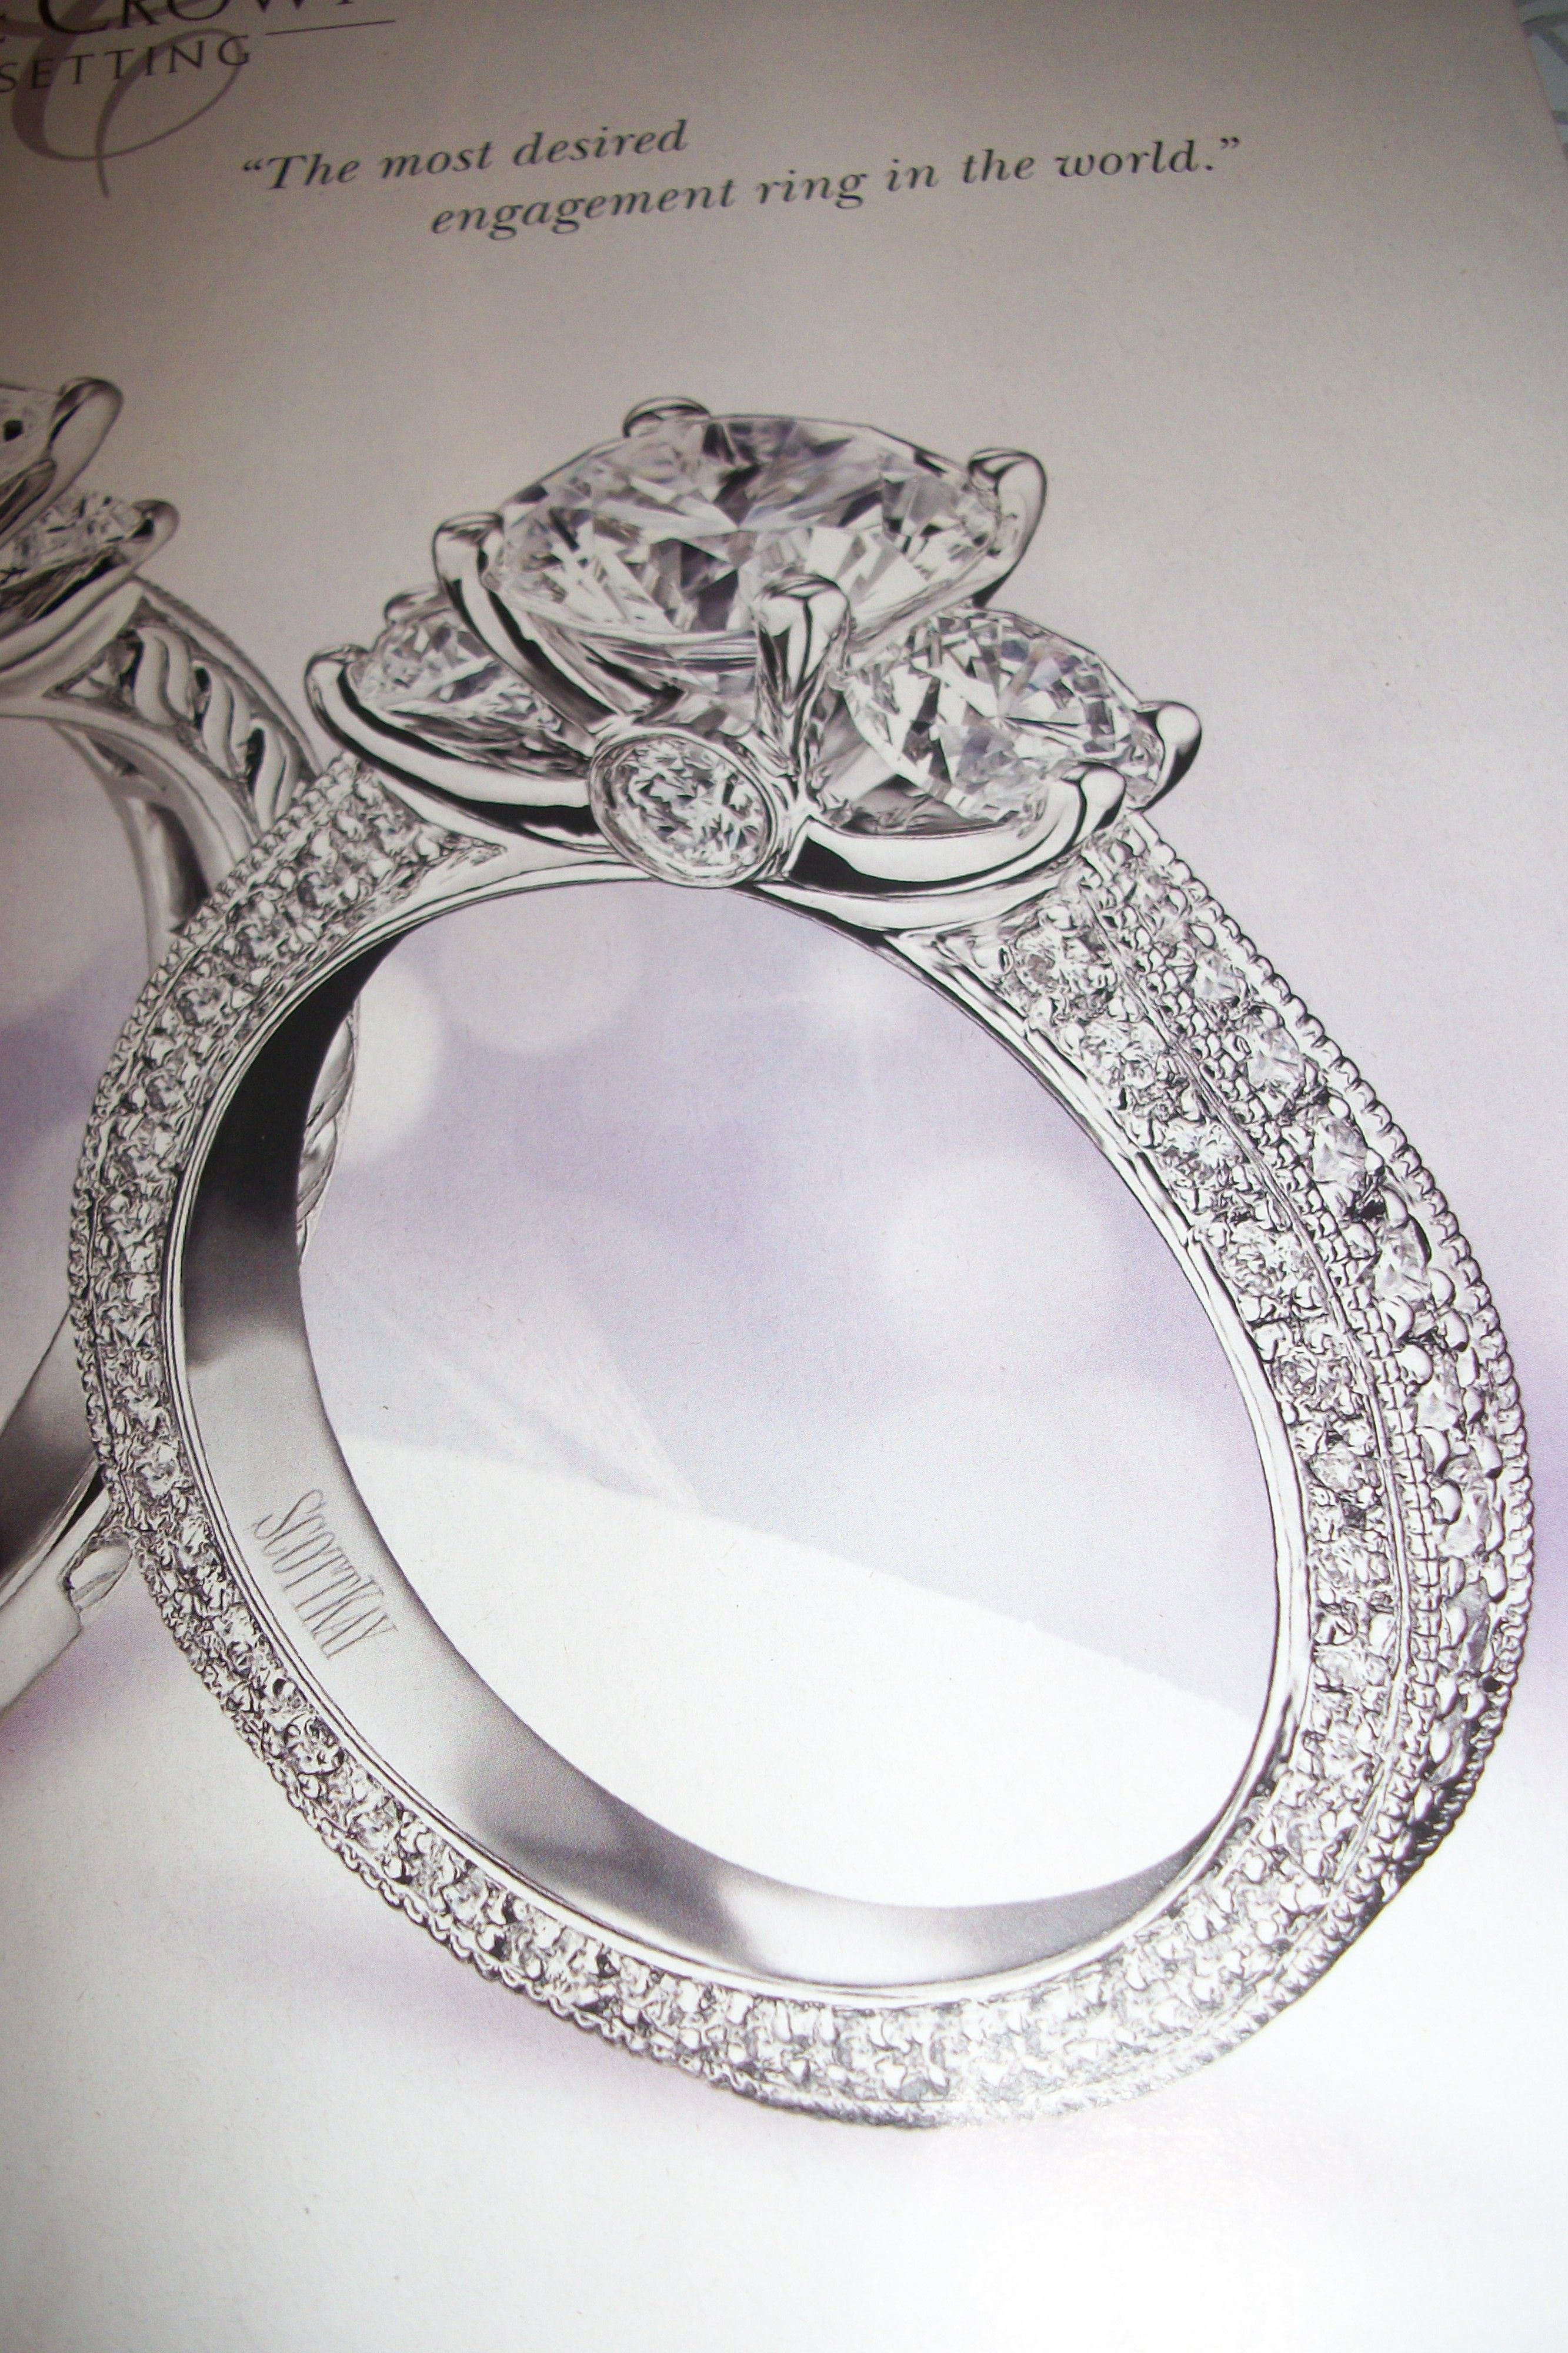 My Dream Wedding Ring!